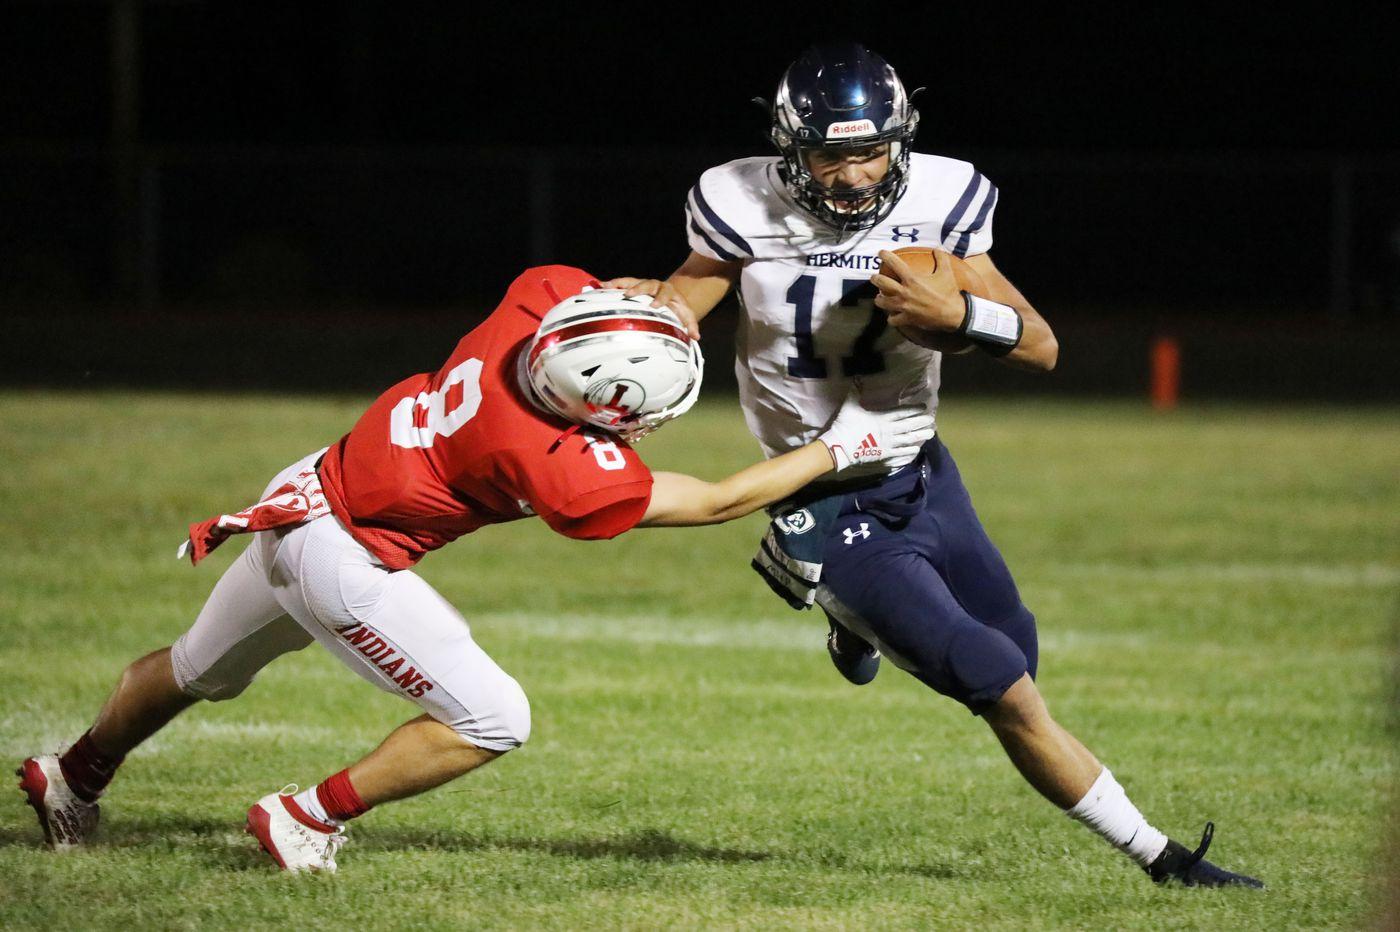 St. Augustine quarterback Austin Leyman is showing his potential